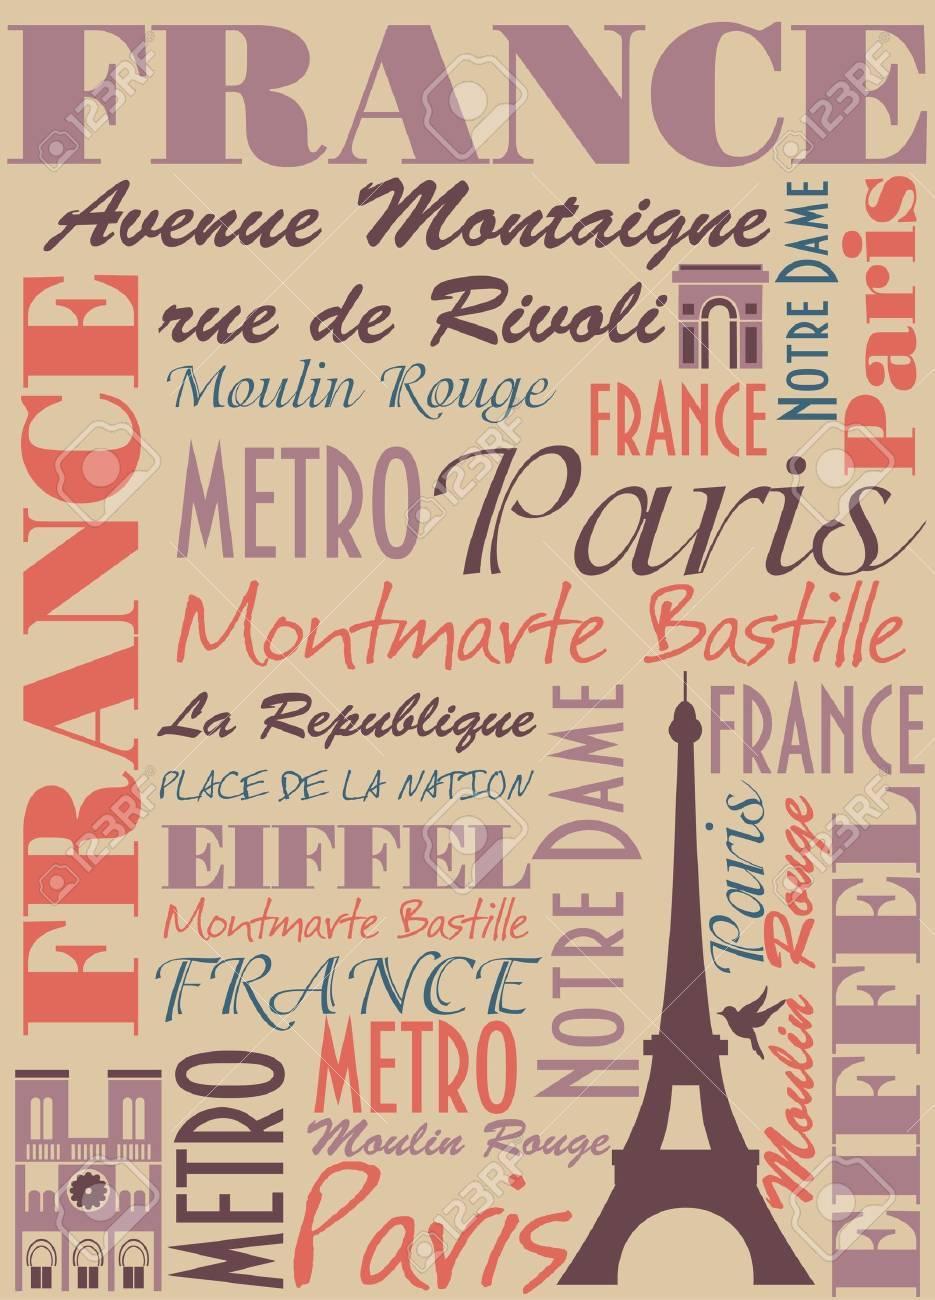 Paris card design  vector illustration Stock Vector - 19252518